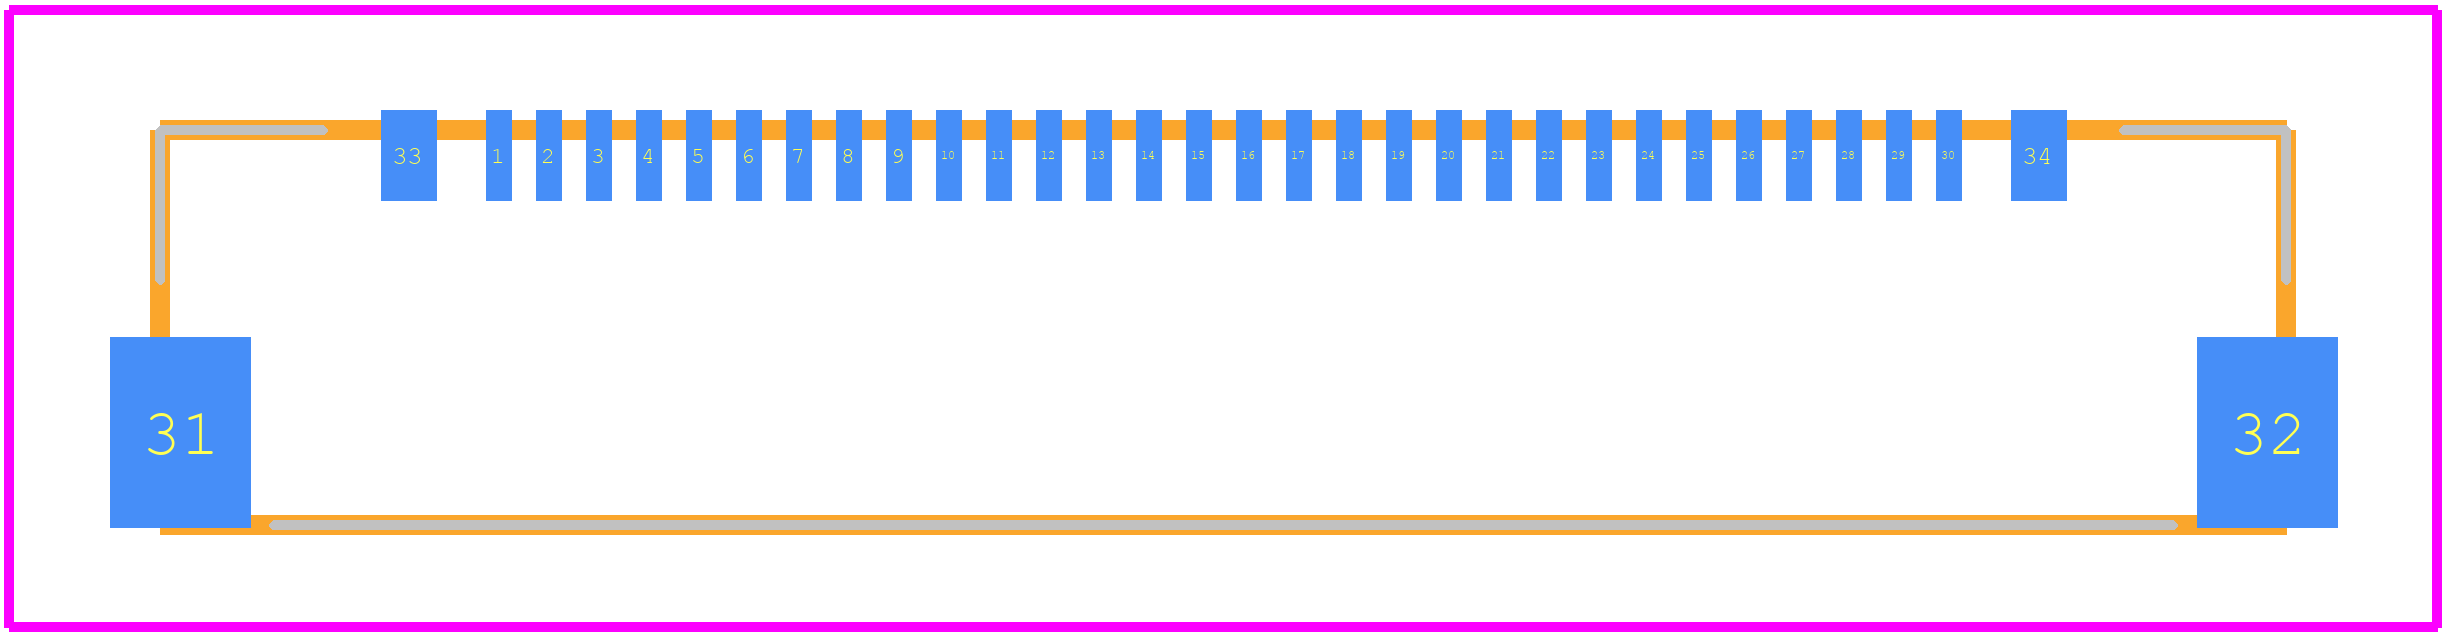 20455-030E-02 - I-Pex PCB footprint - Other - 20455-030E-02